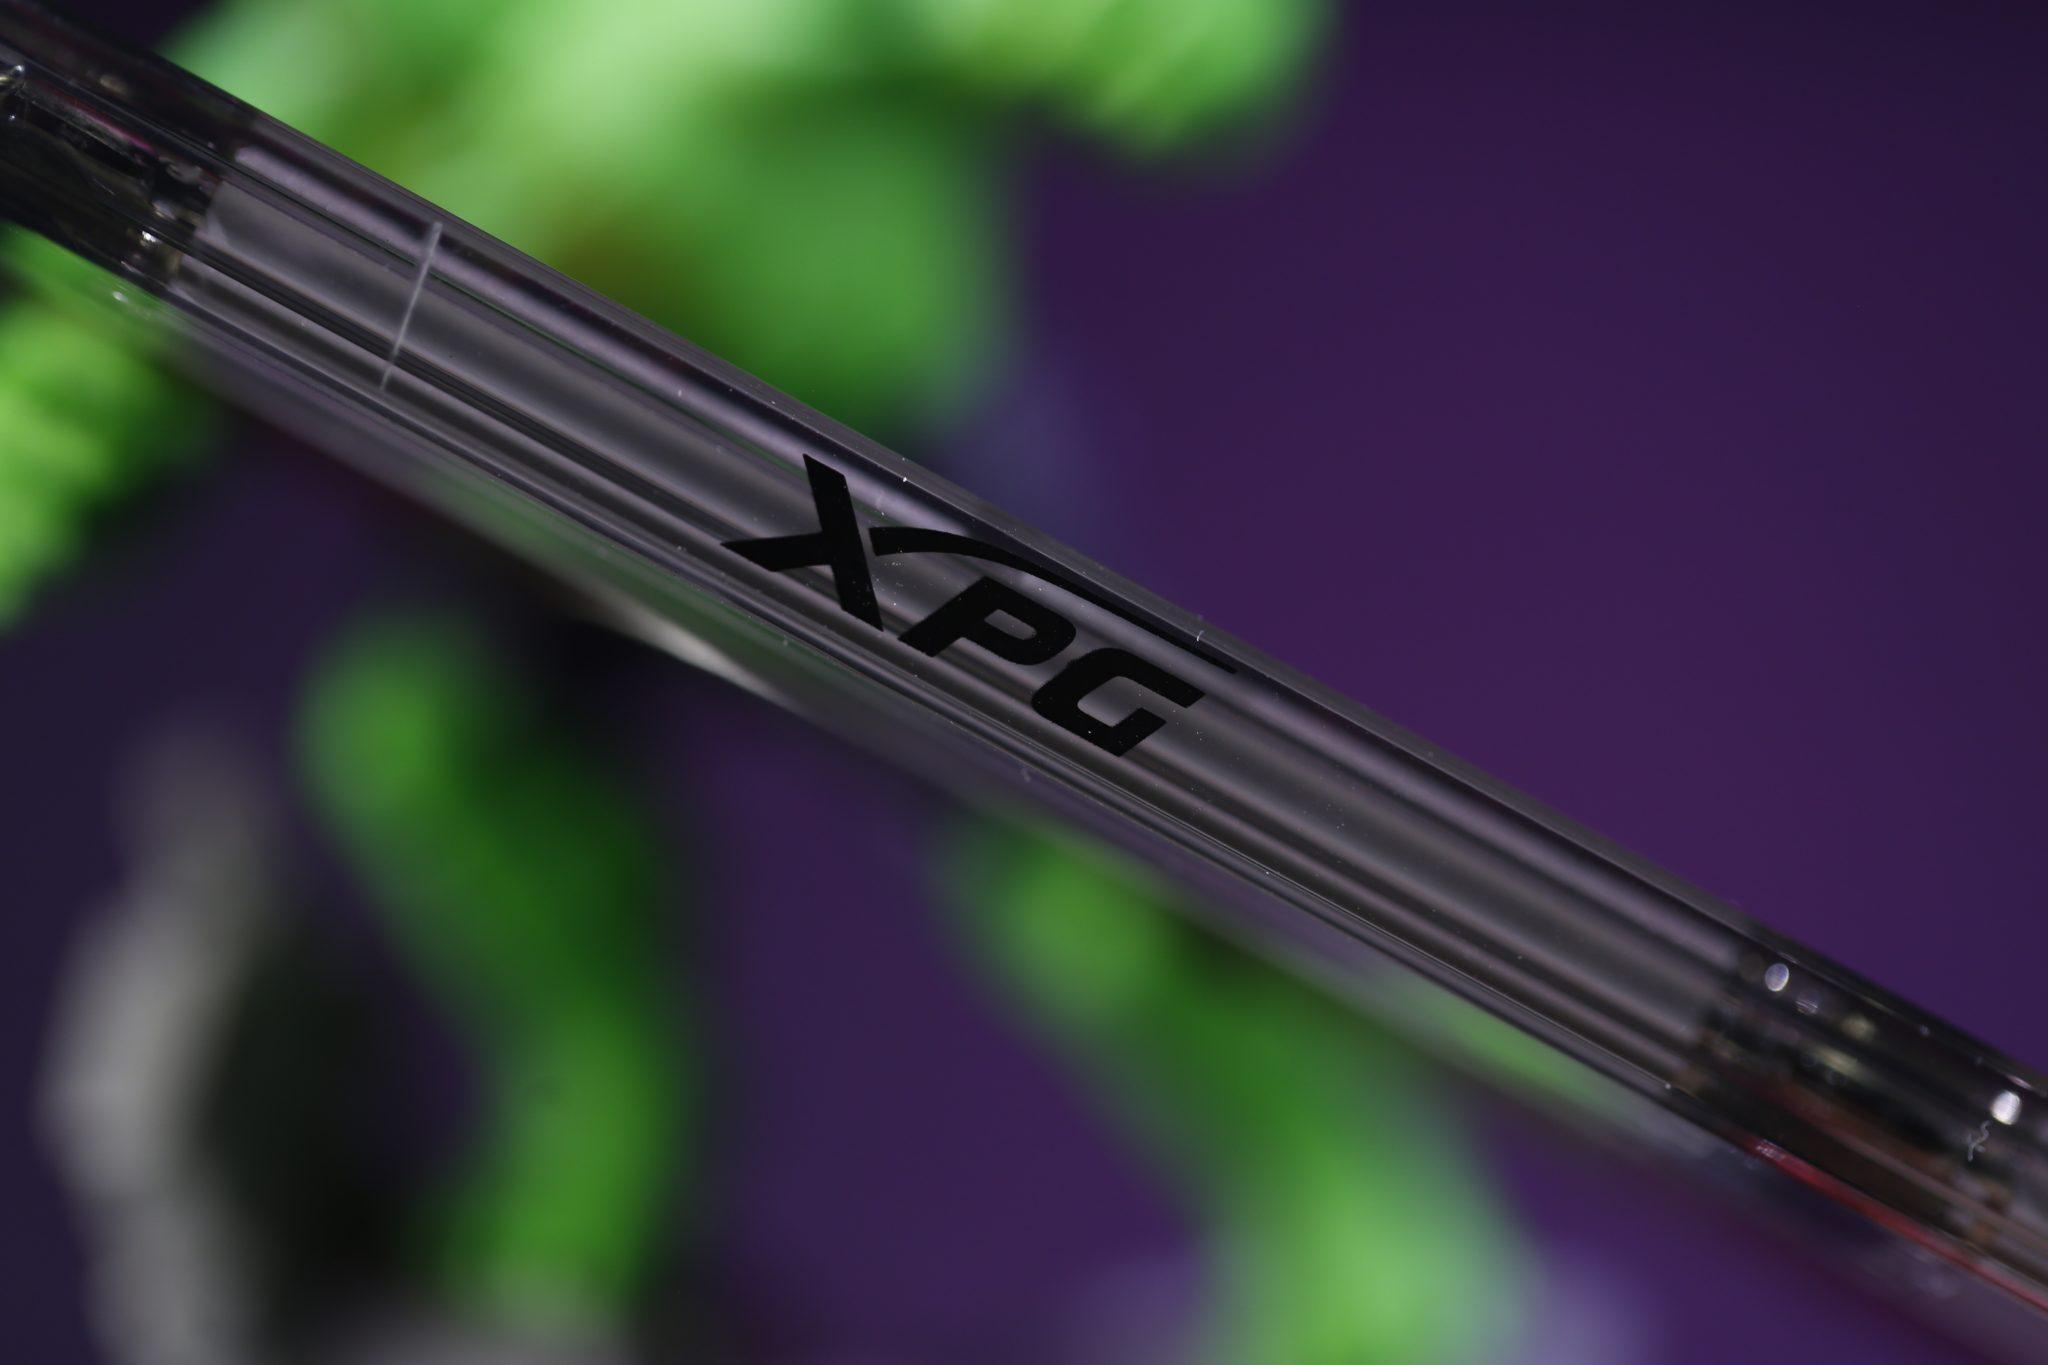 ADATA XPG Spectrix D80 RAM (44)